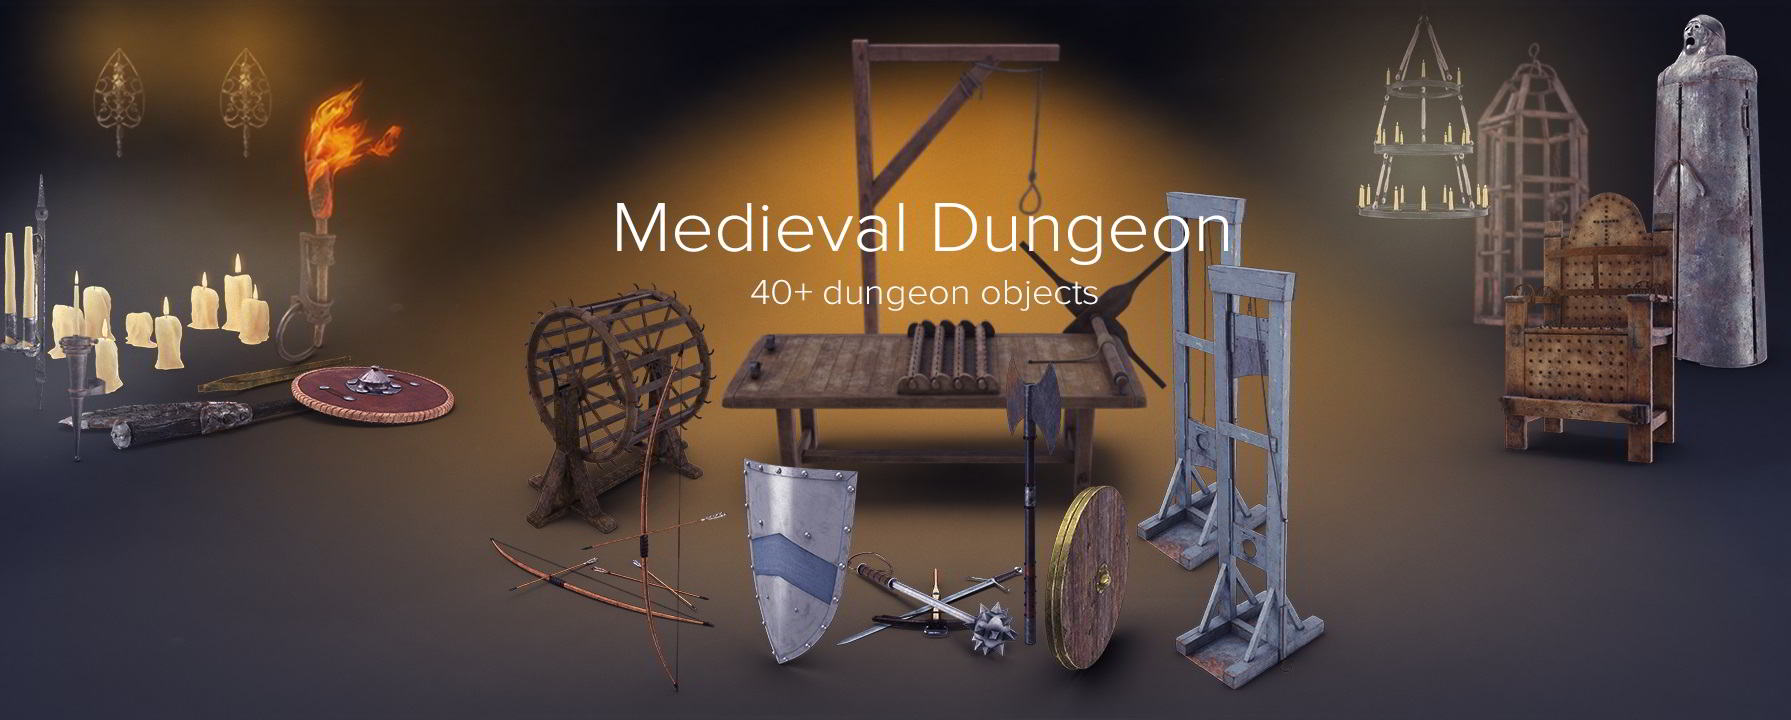 PixelSquid – Medieval Dungeon Collection free download